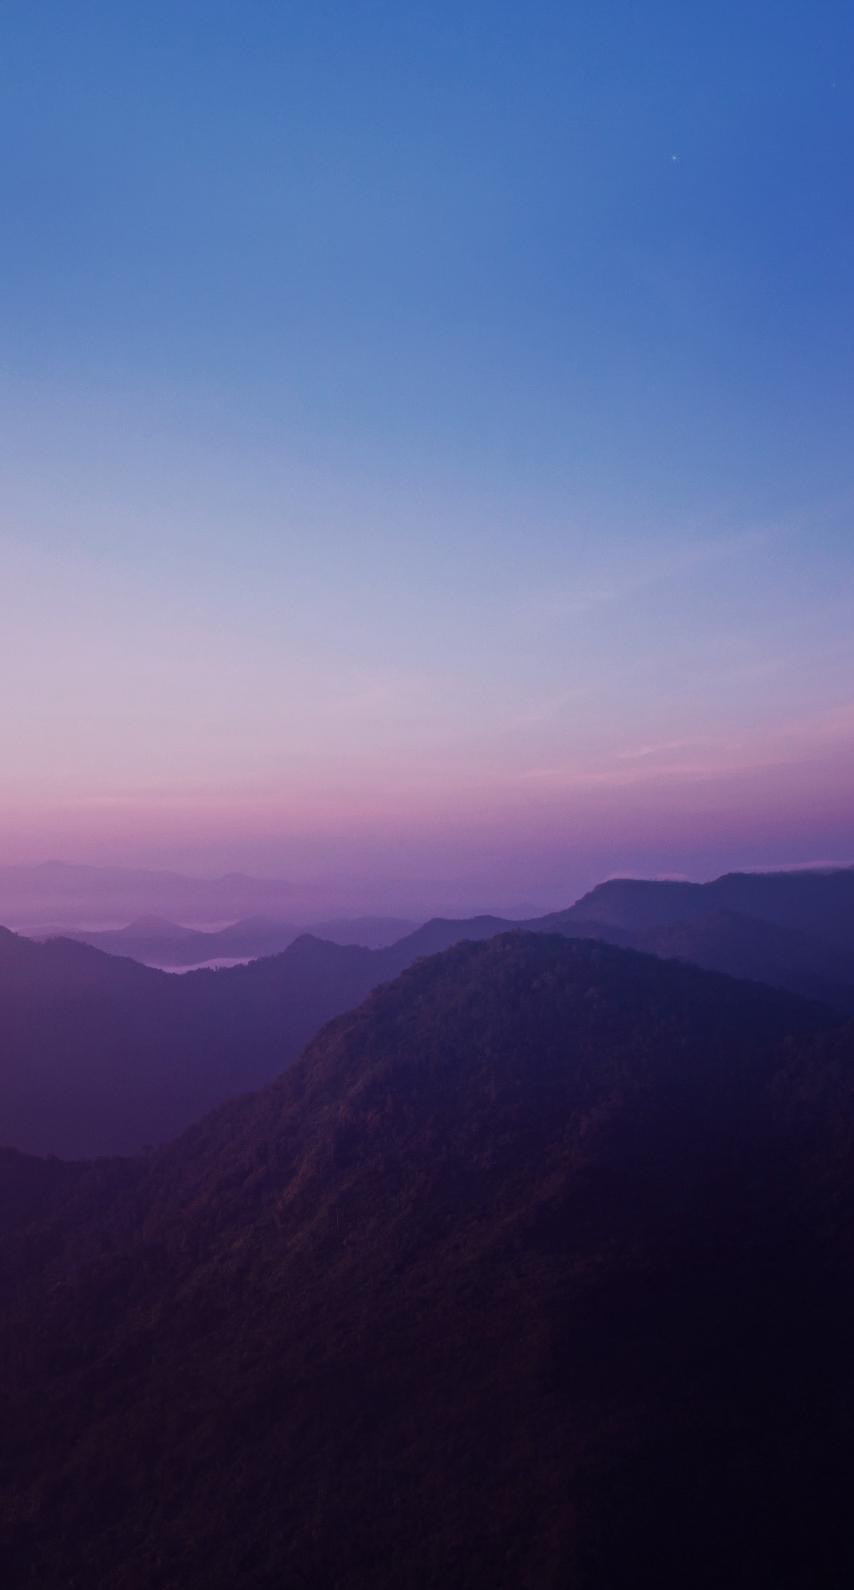 sun, no person, dawn, dusk, outdoors, daylight, scenic, mist, hike